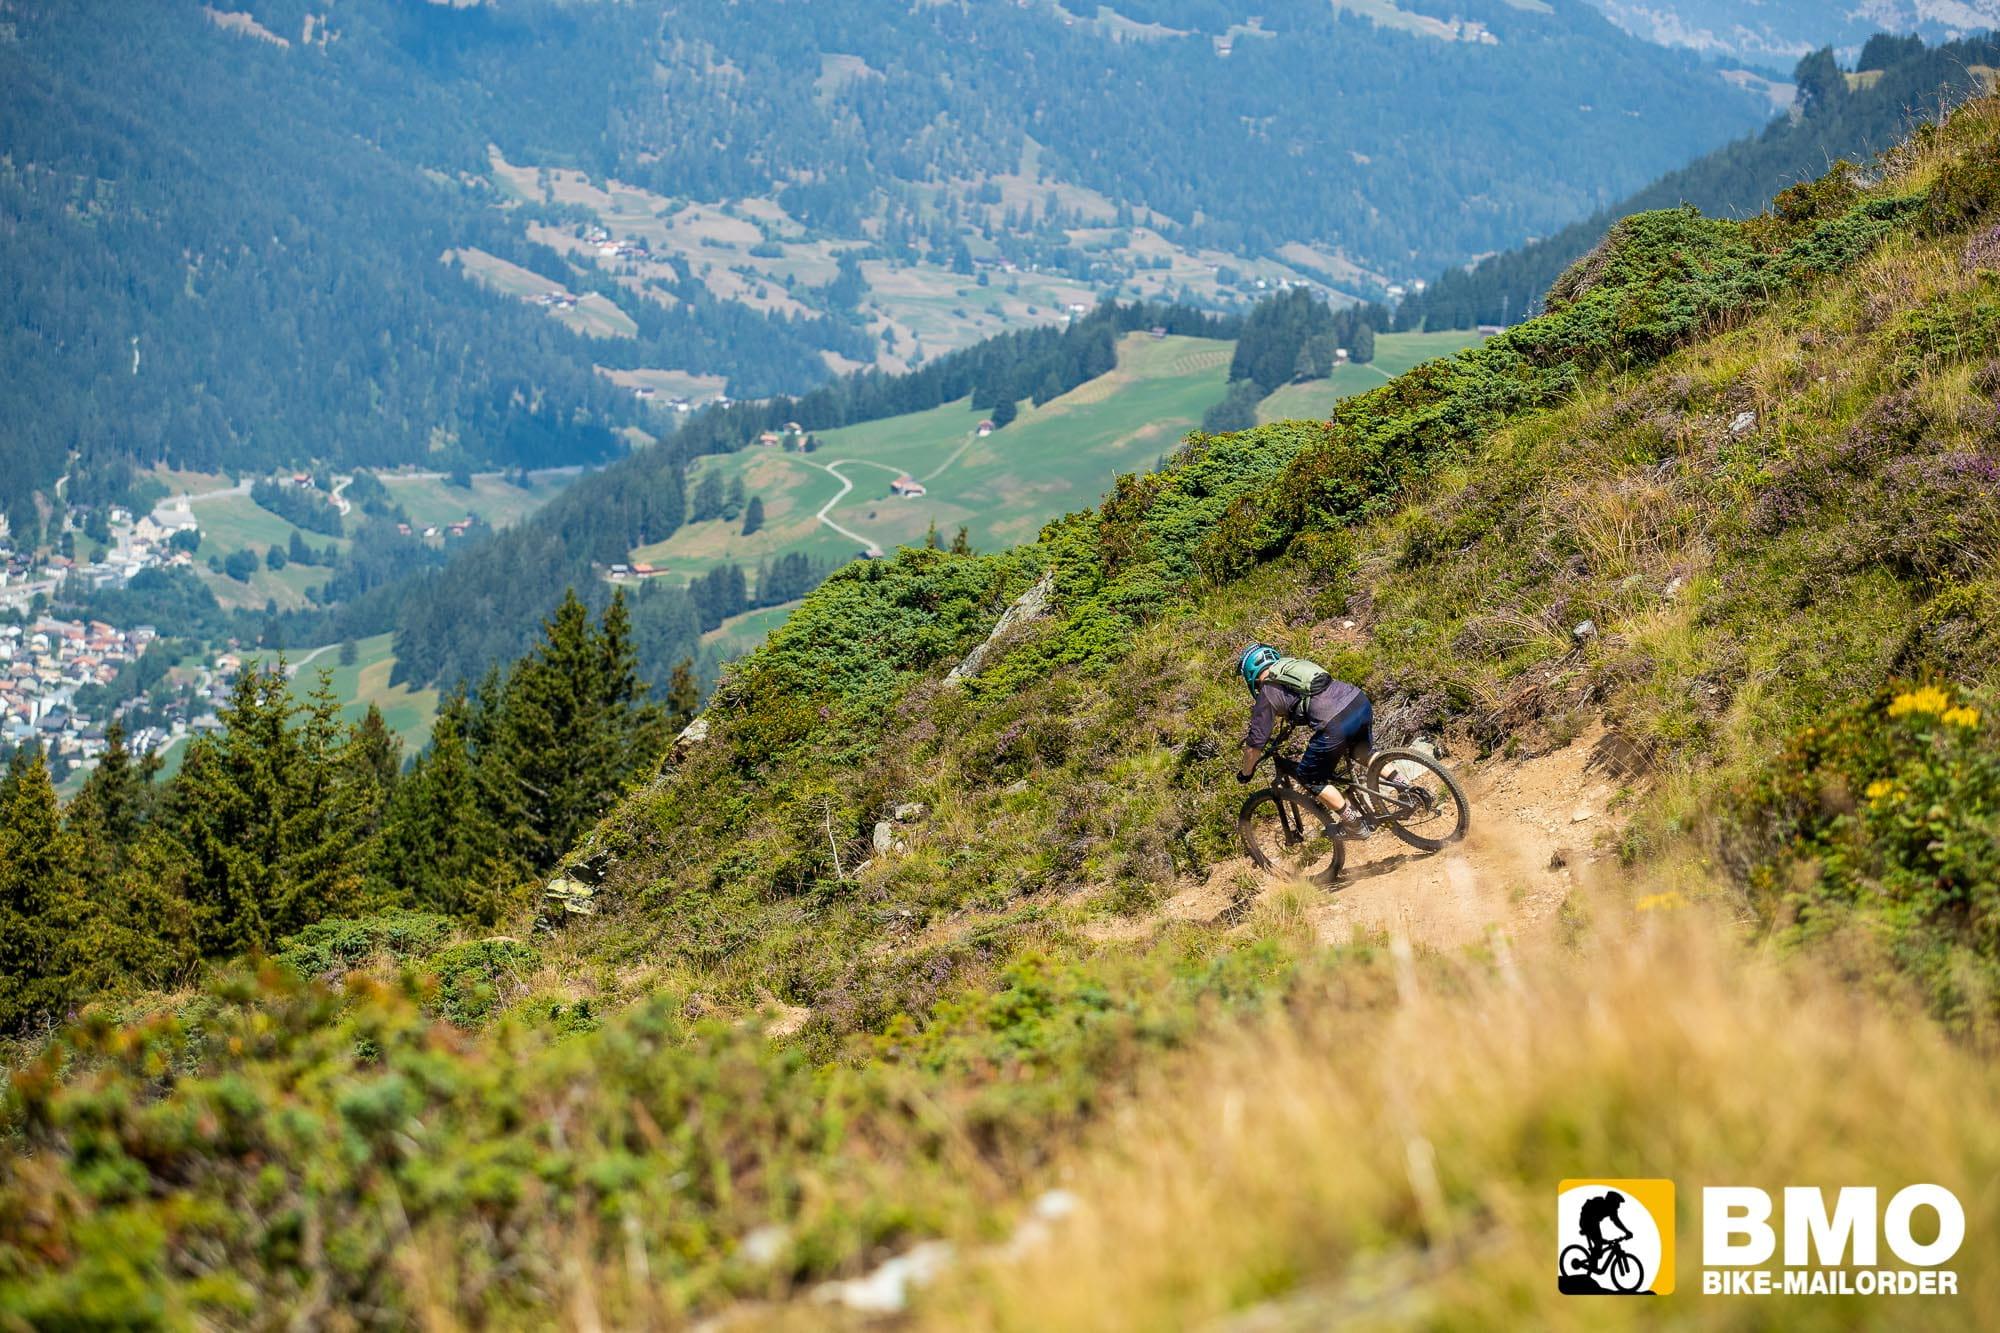 BMO-Bike-Mailorder-Lenzerheide-Home-of-Trails-5